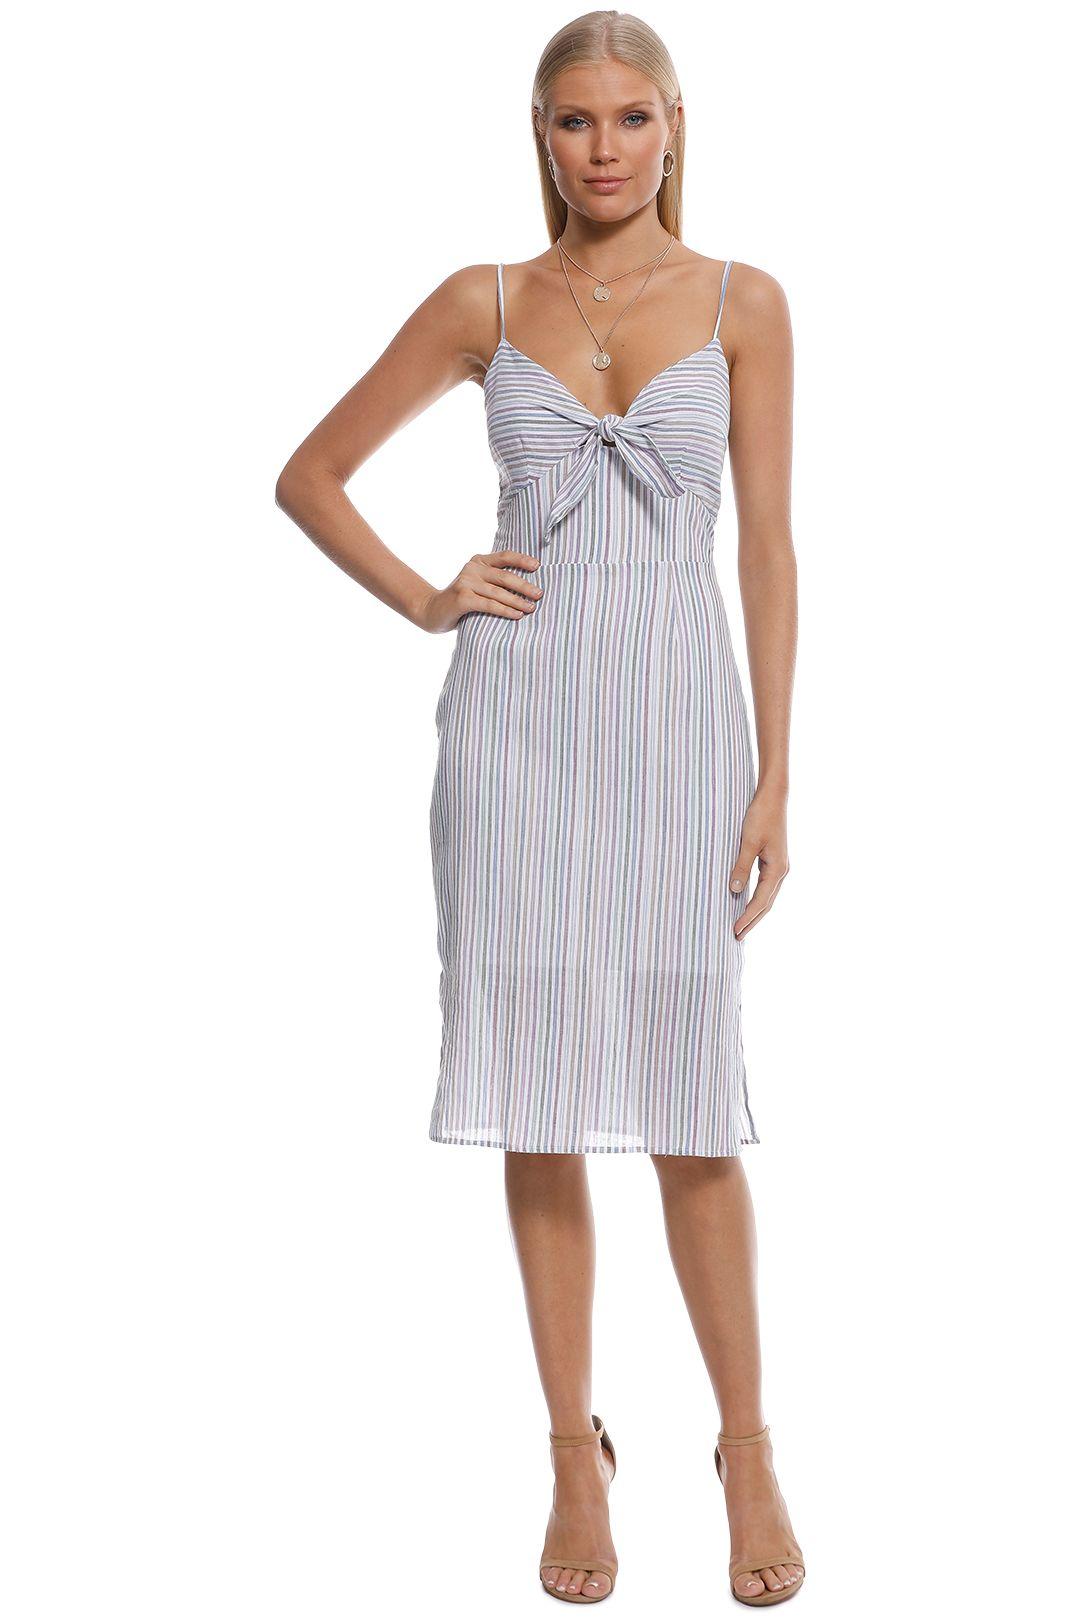 Cooper St - Bay Knot Stripe Dress - Blue Stripe - Front